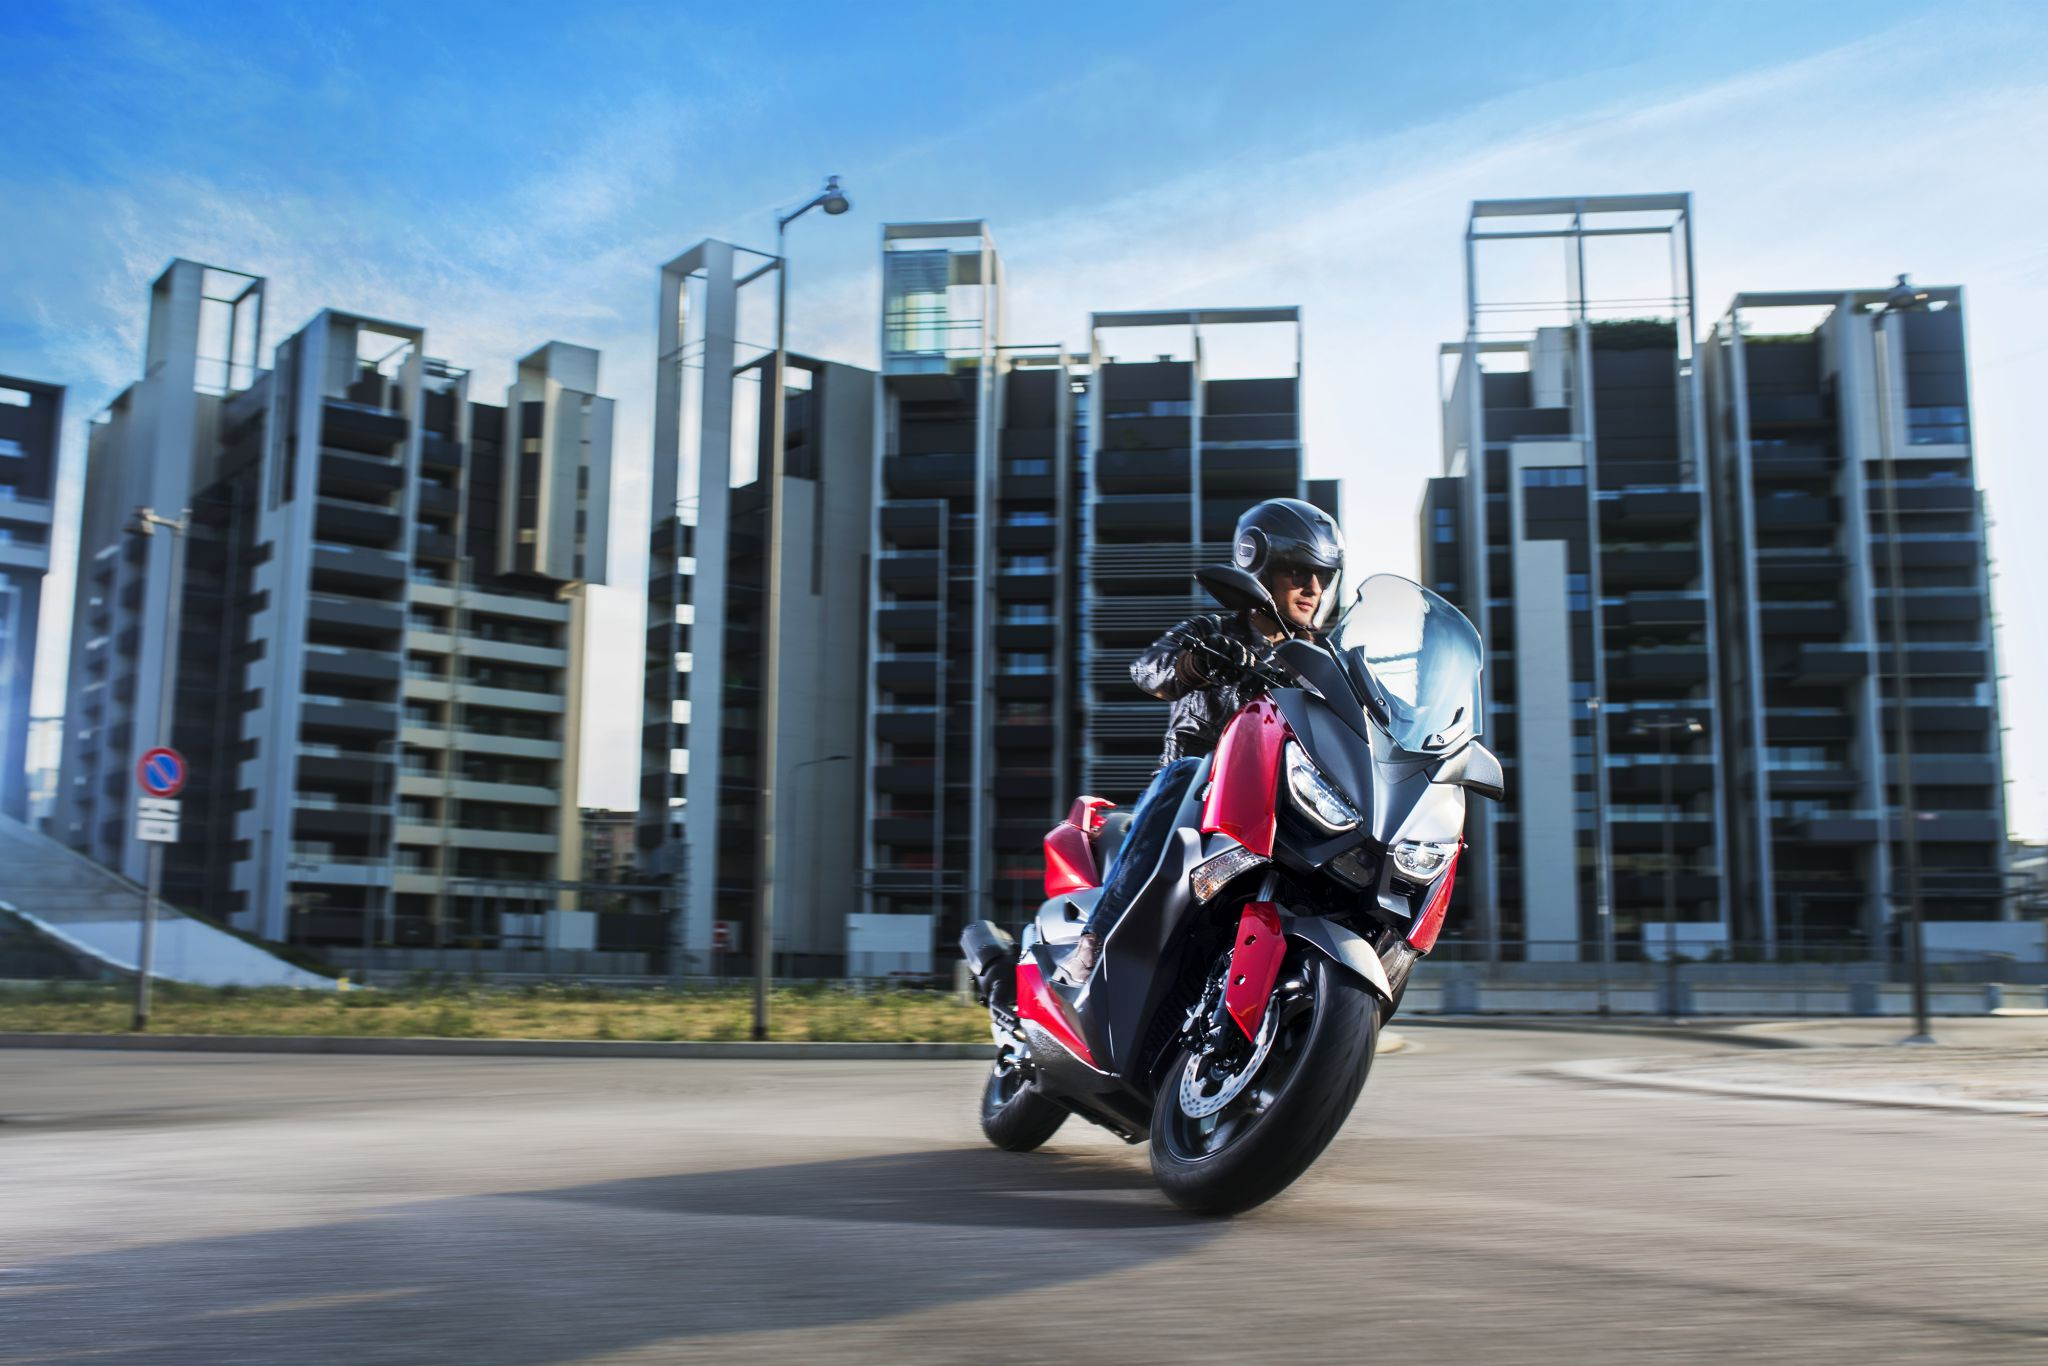 Yamaha voegt nieuwe 125 toe aan X-MAX familie